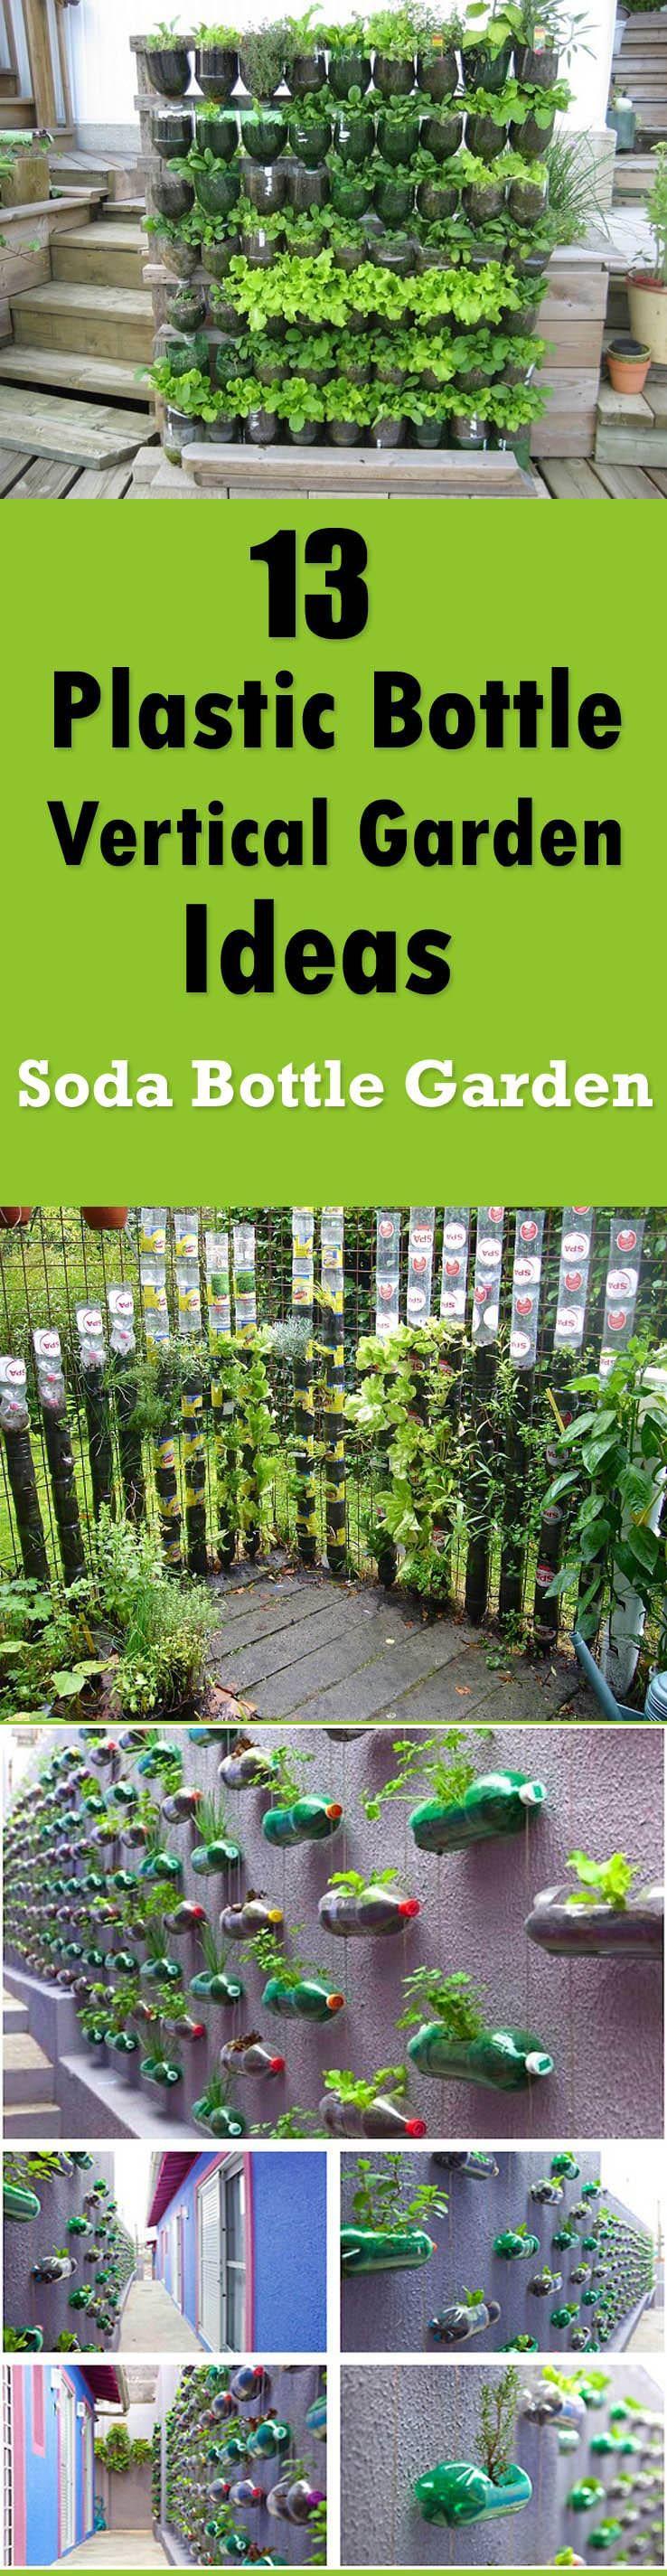 Follow these 13 plastic bottle vertical garden